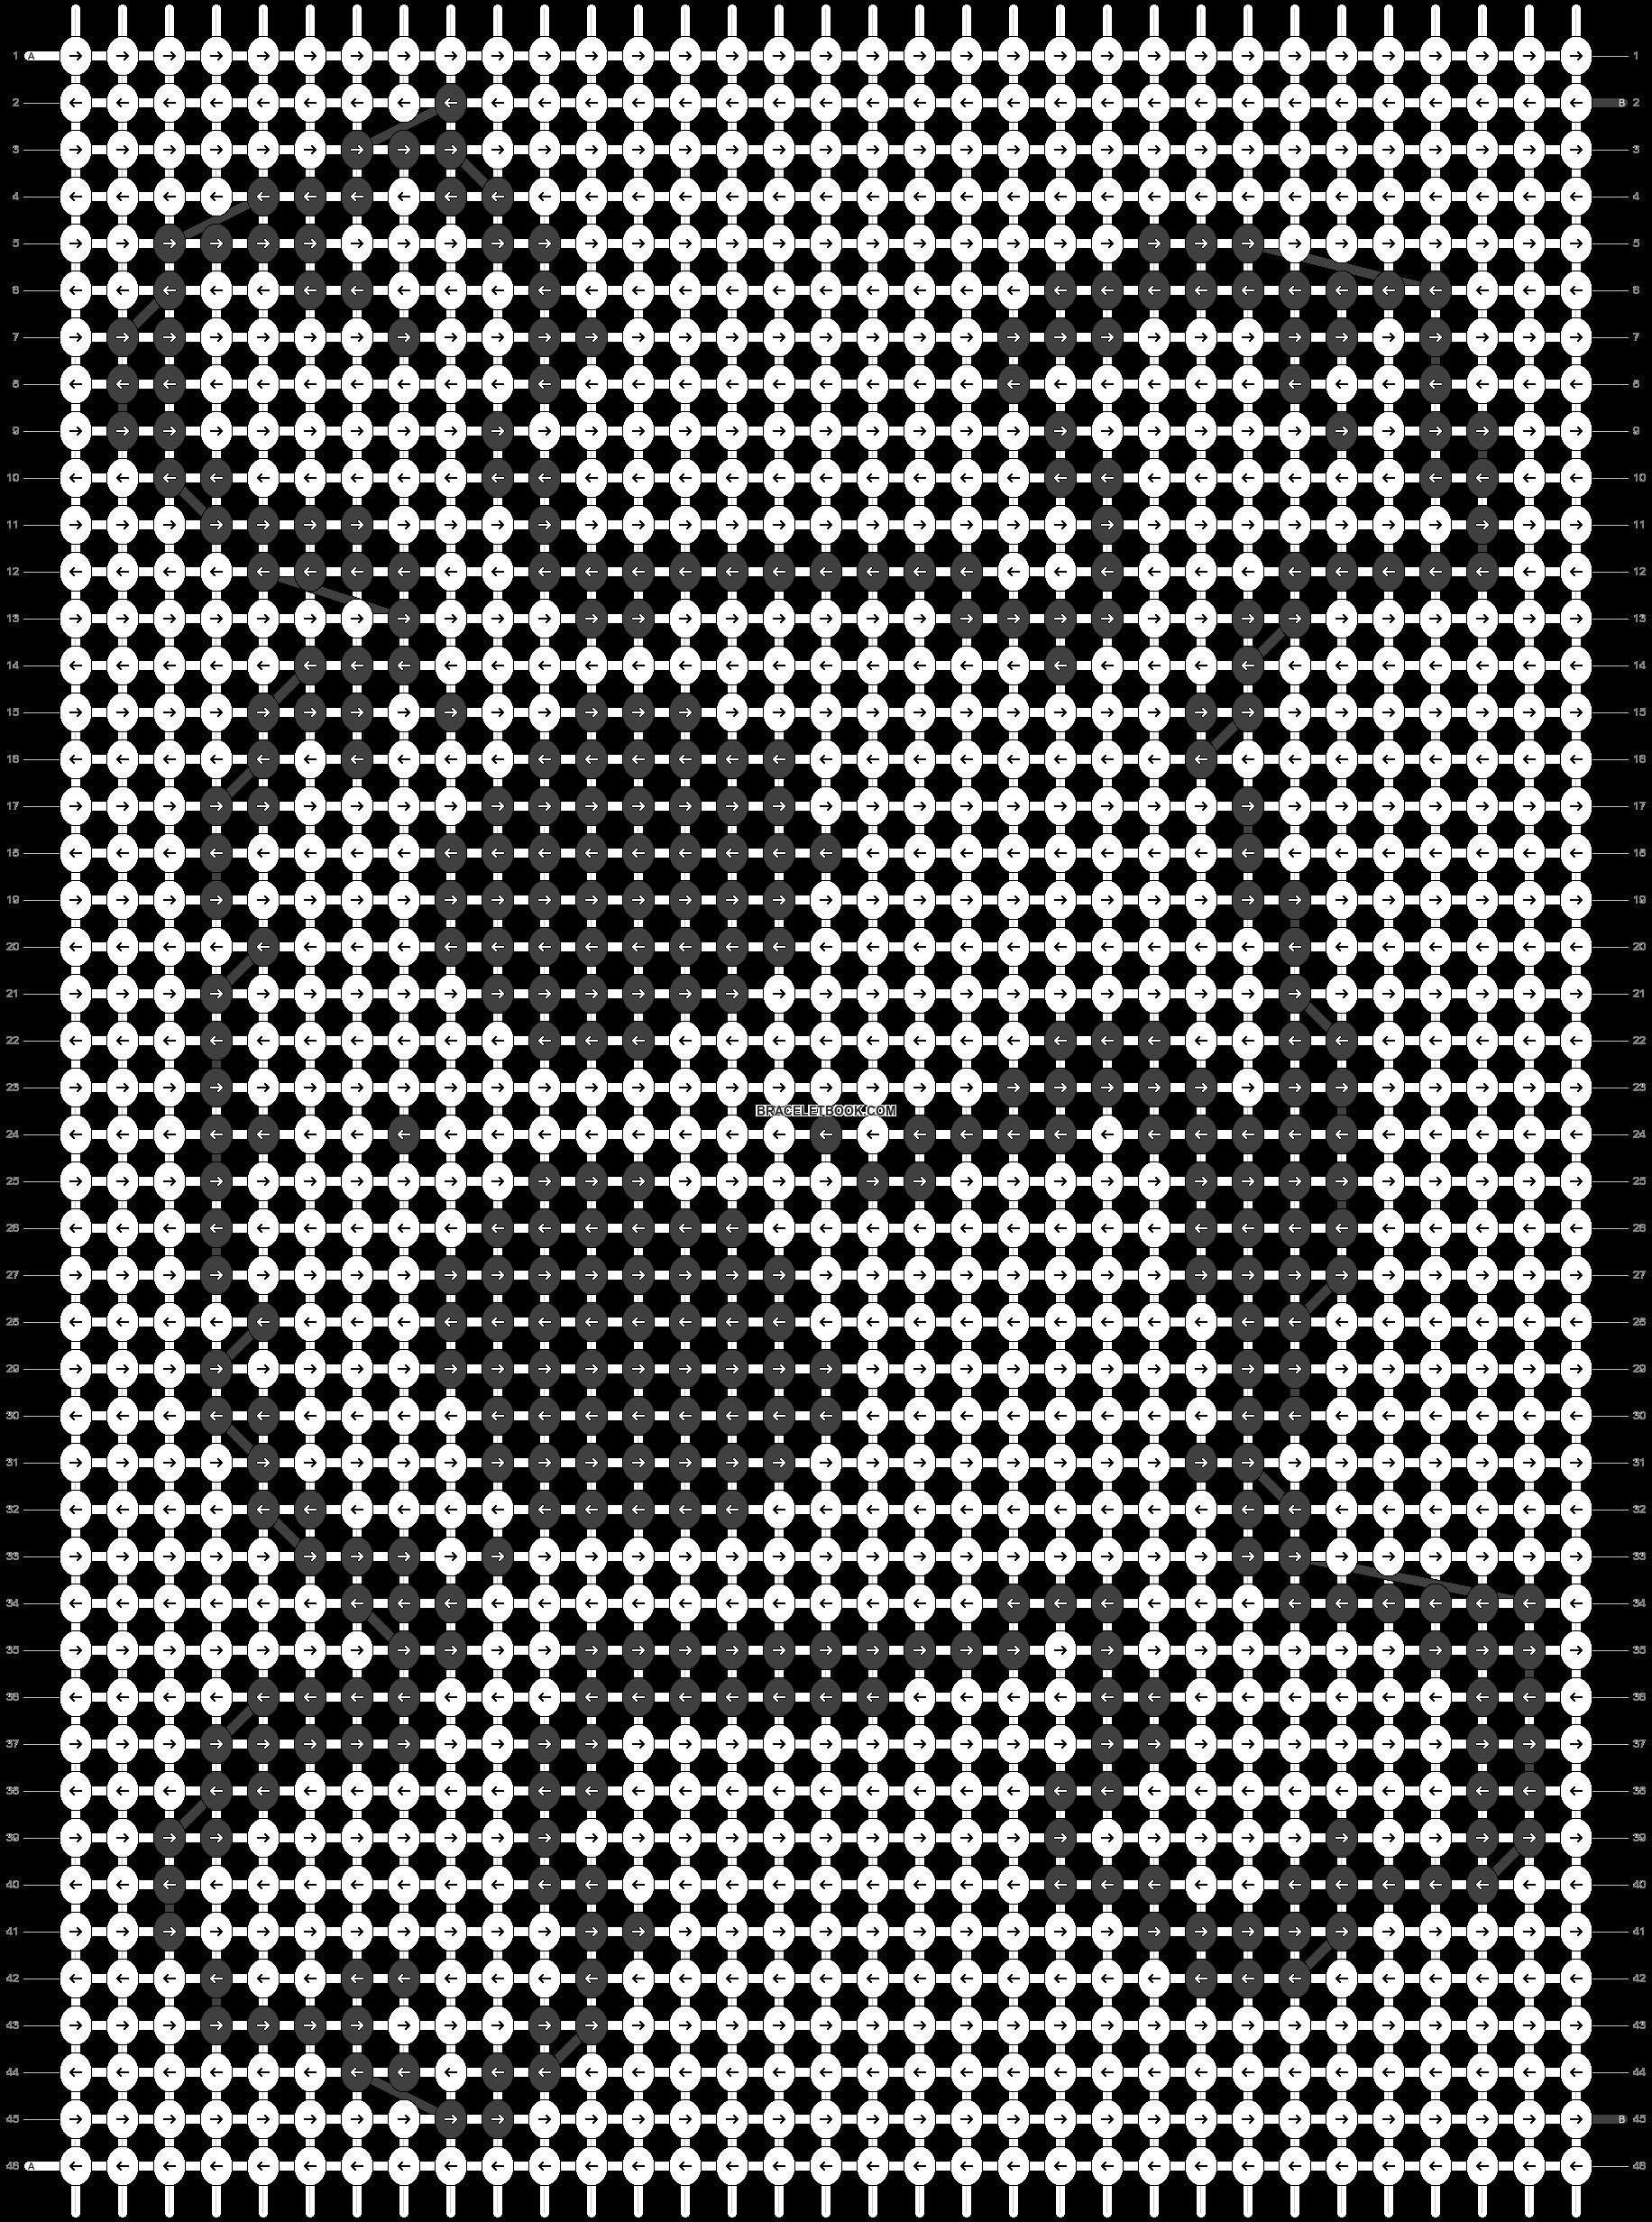 Alpha pattern #512 pattern